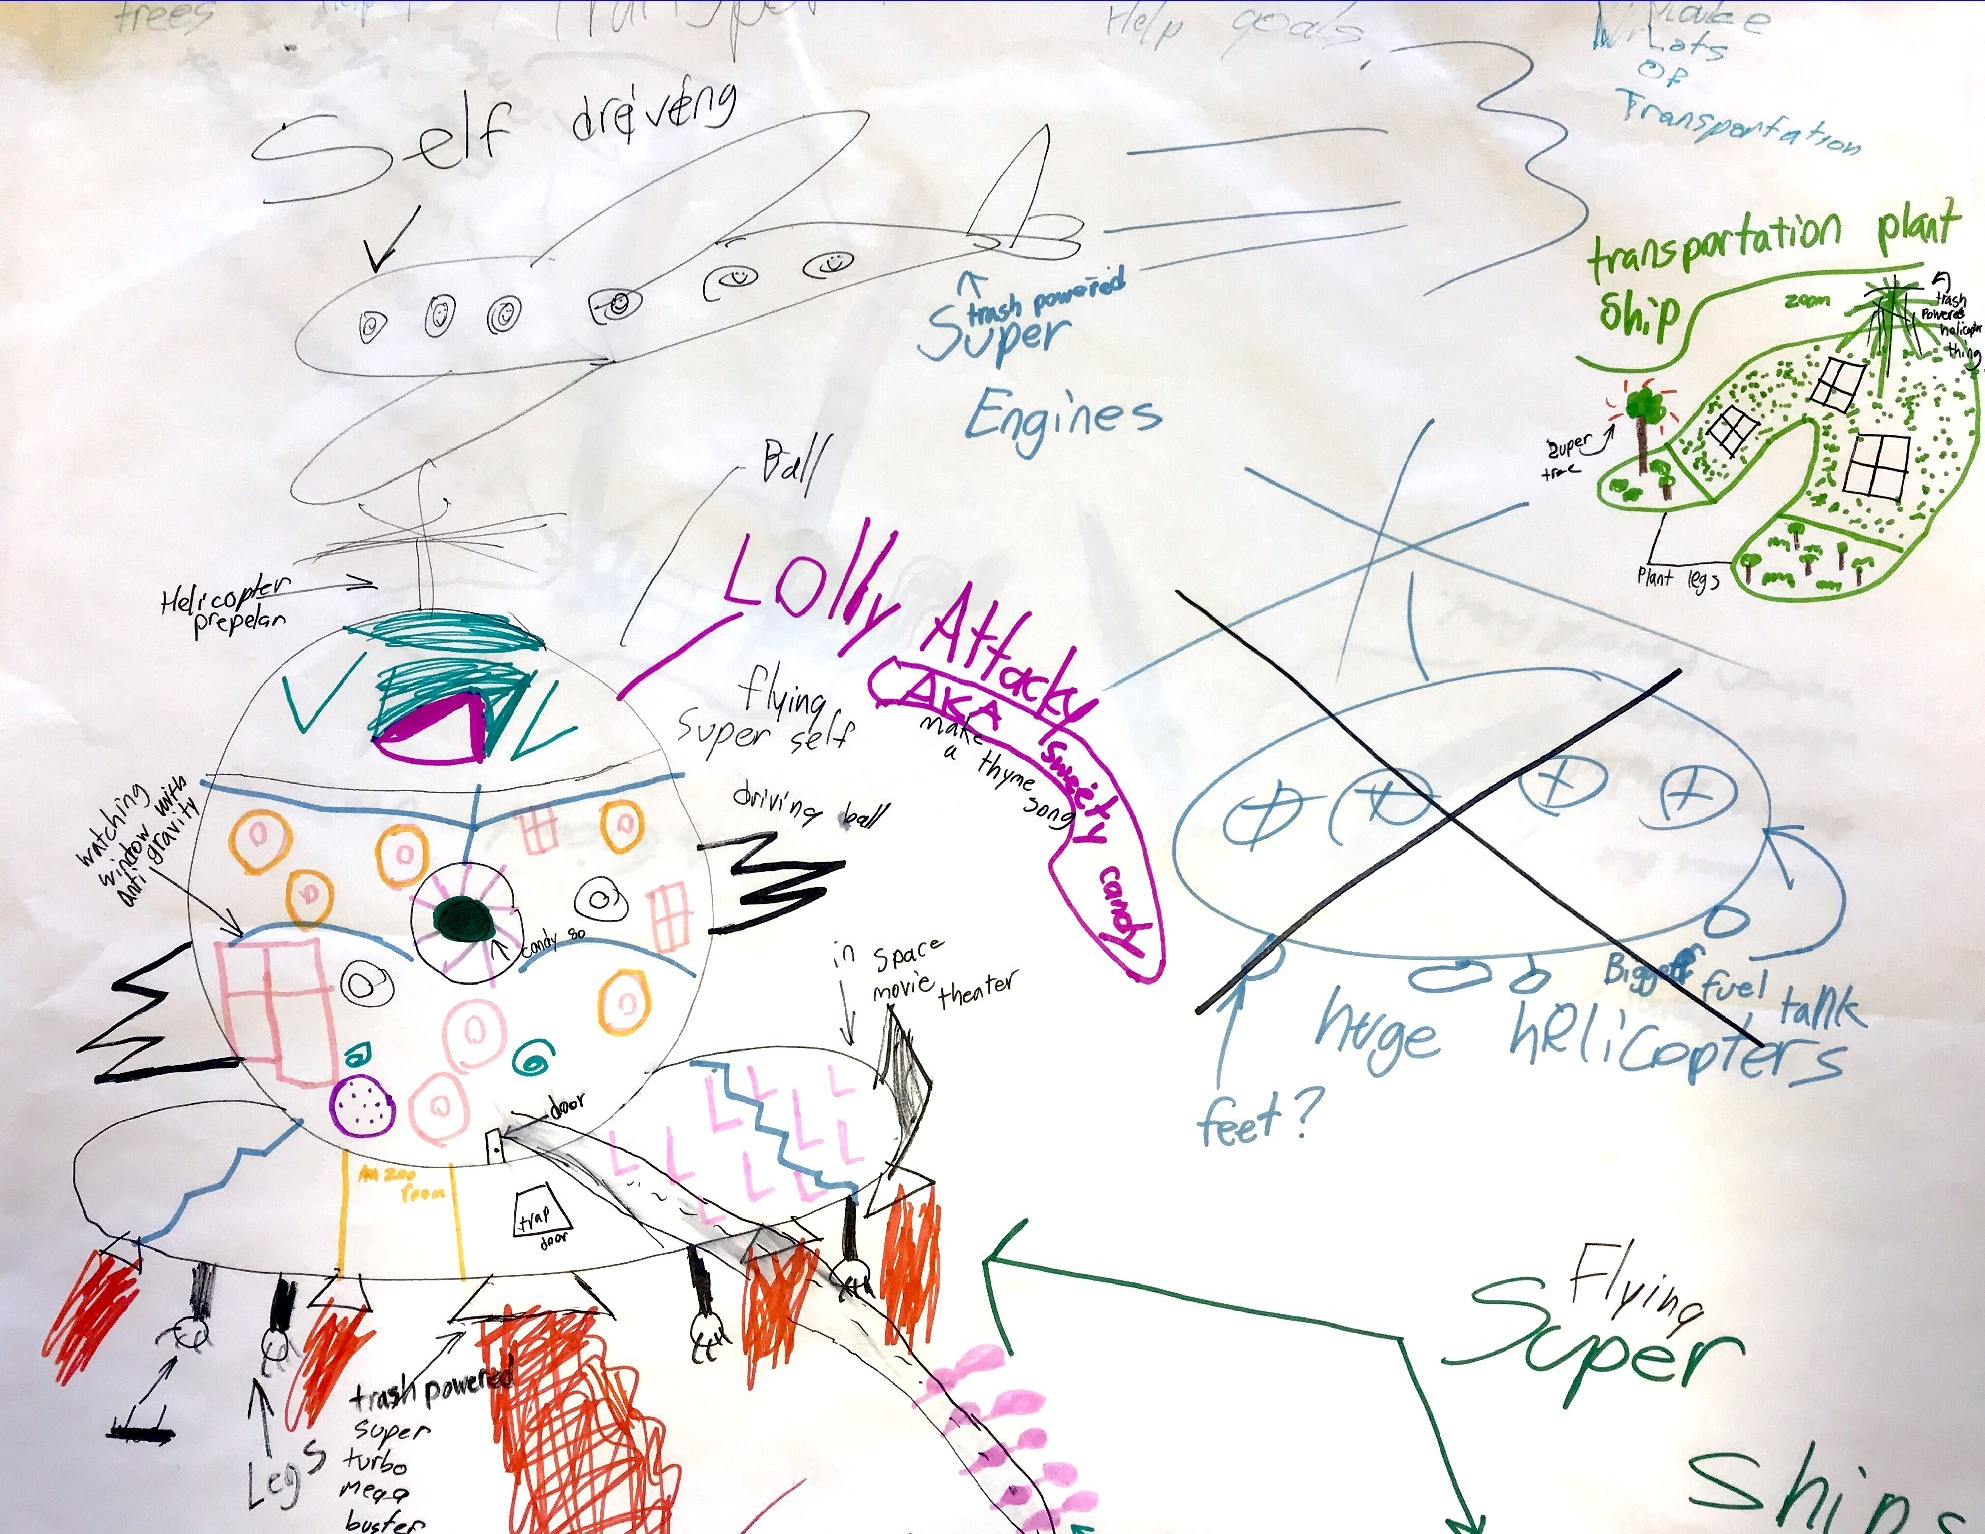 lower El innovation brainstorms-page-12.jpg